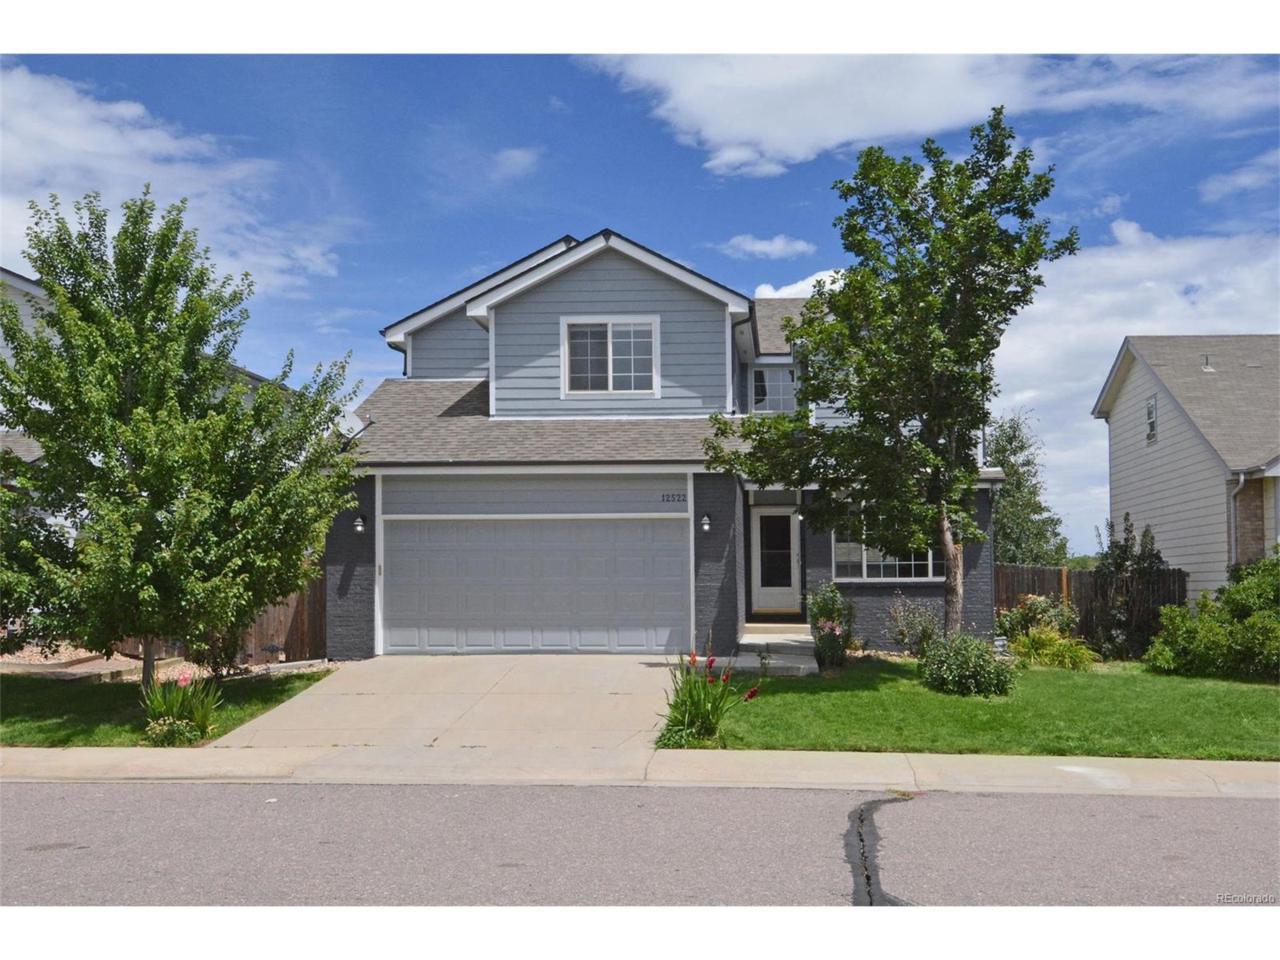 12522 Alcott Street, Broomfield, CO 80020 (MLS #8435831) :: 8z Real Estate